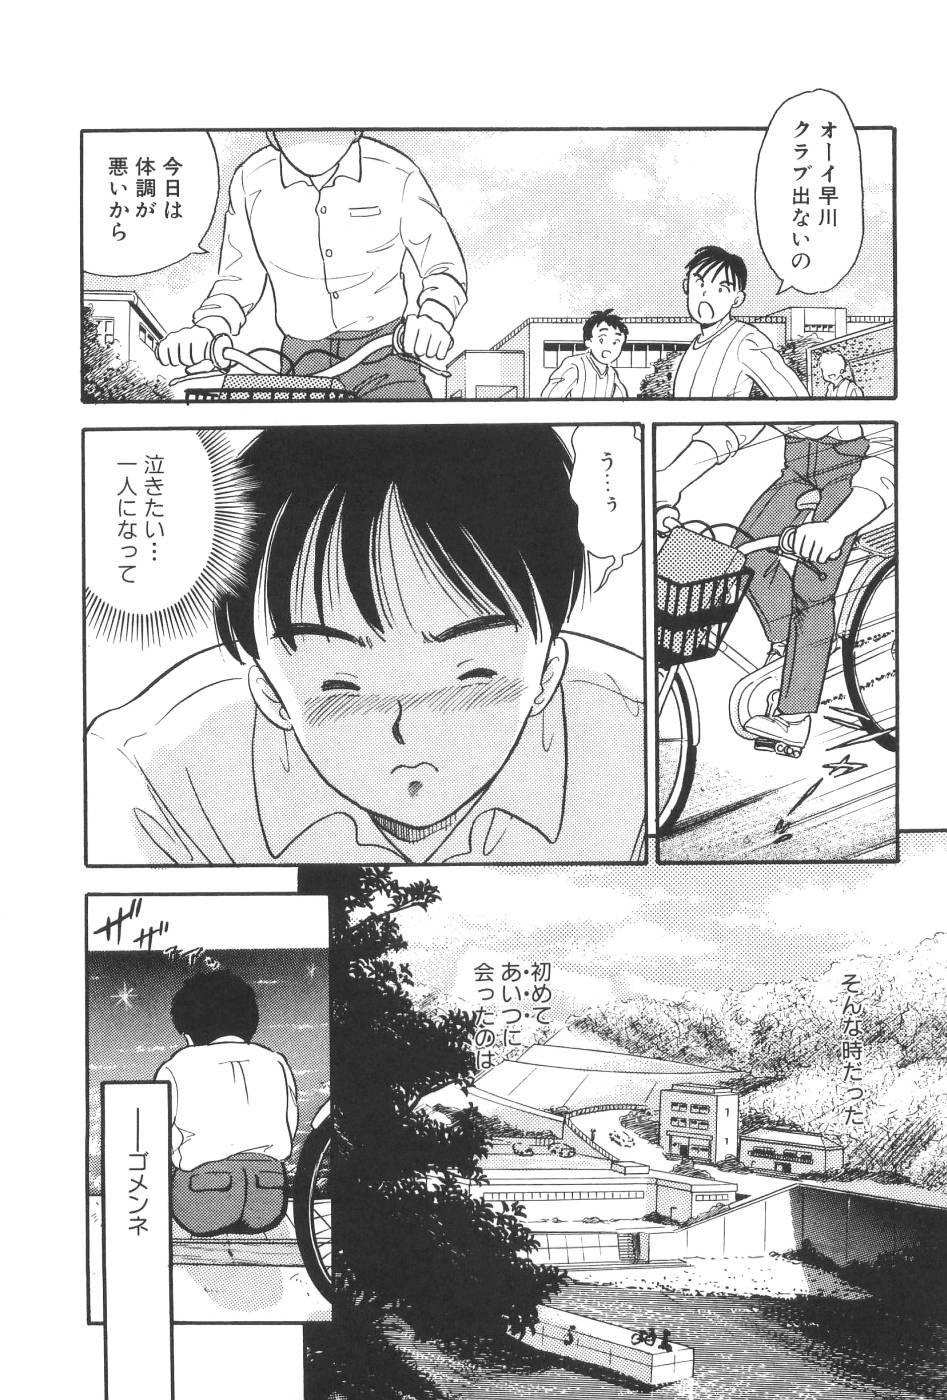 Namioto Densetsu 8